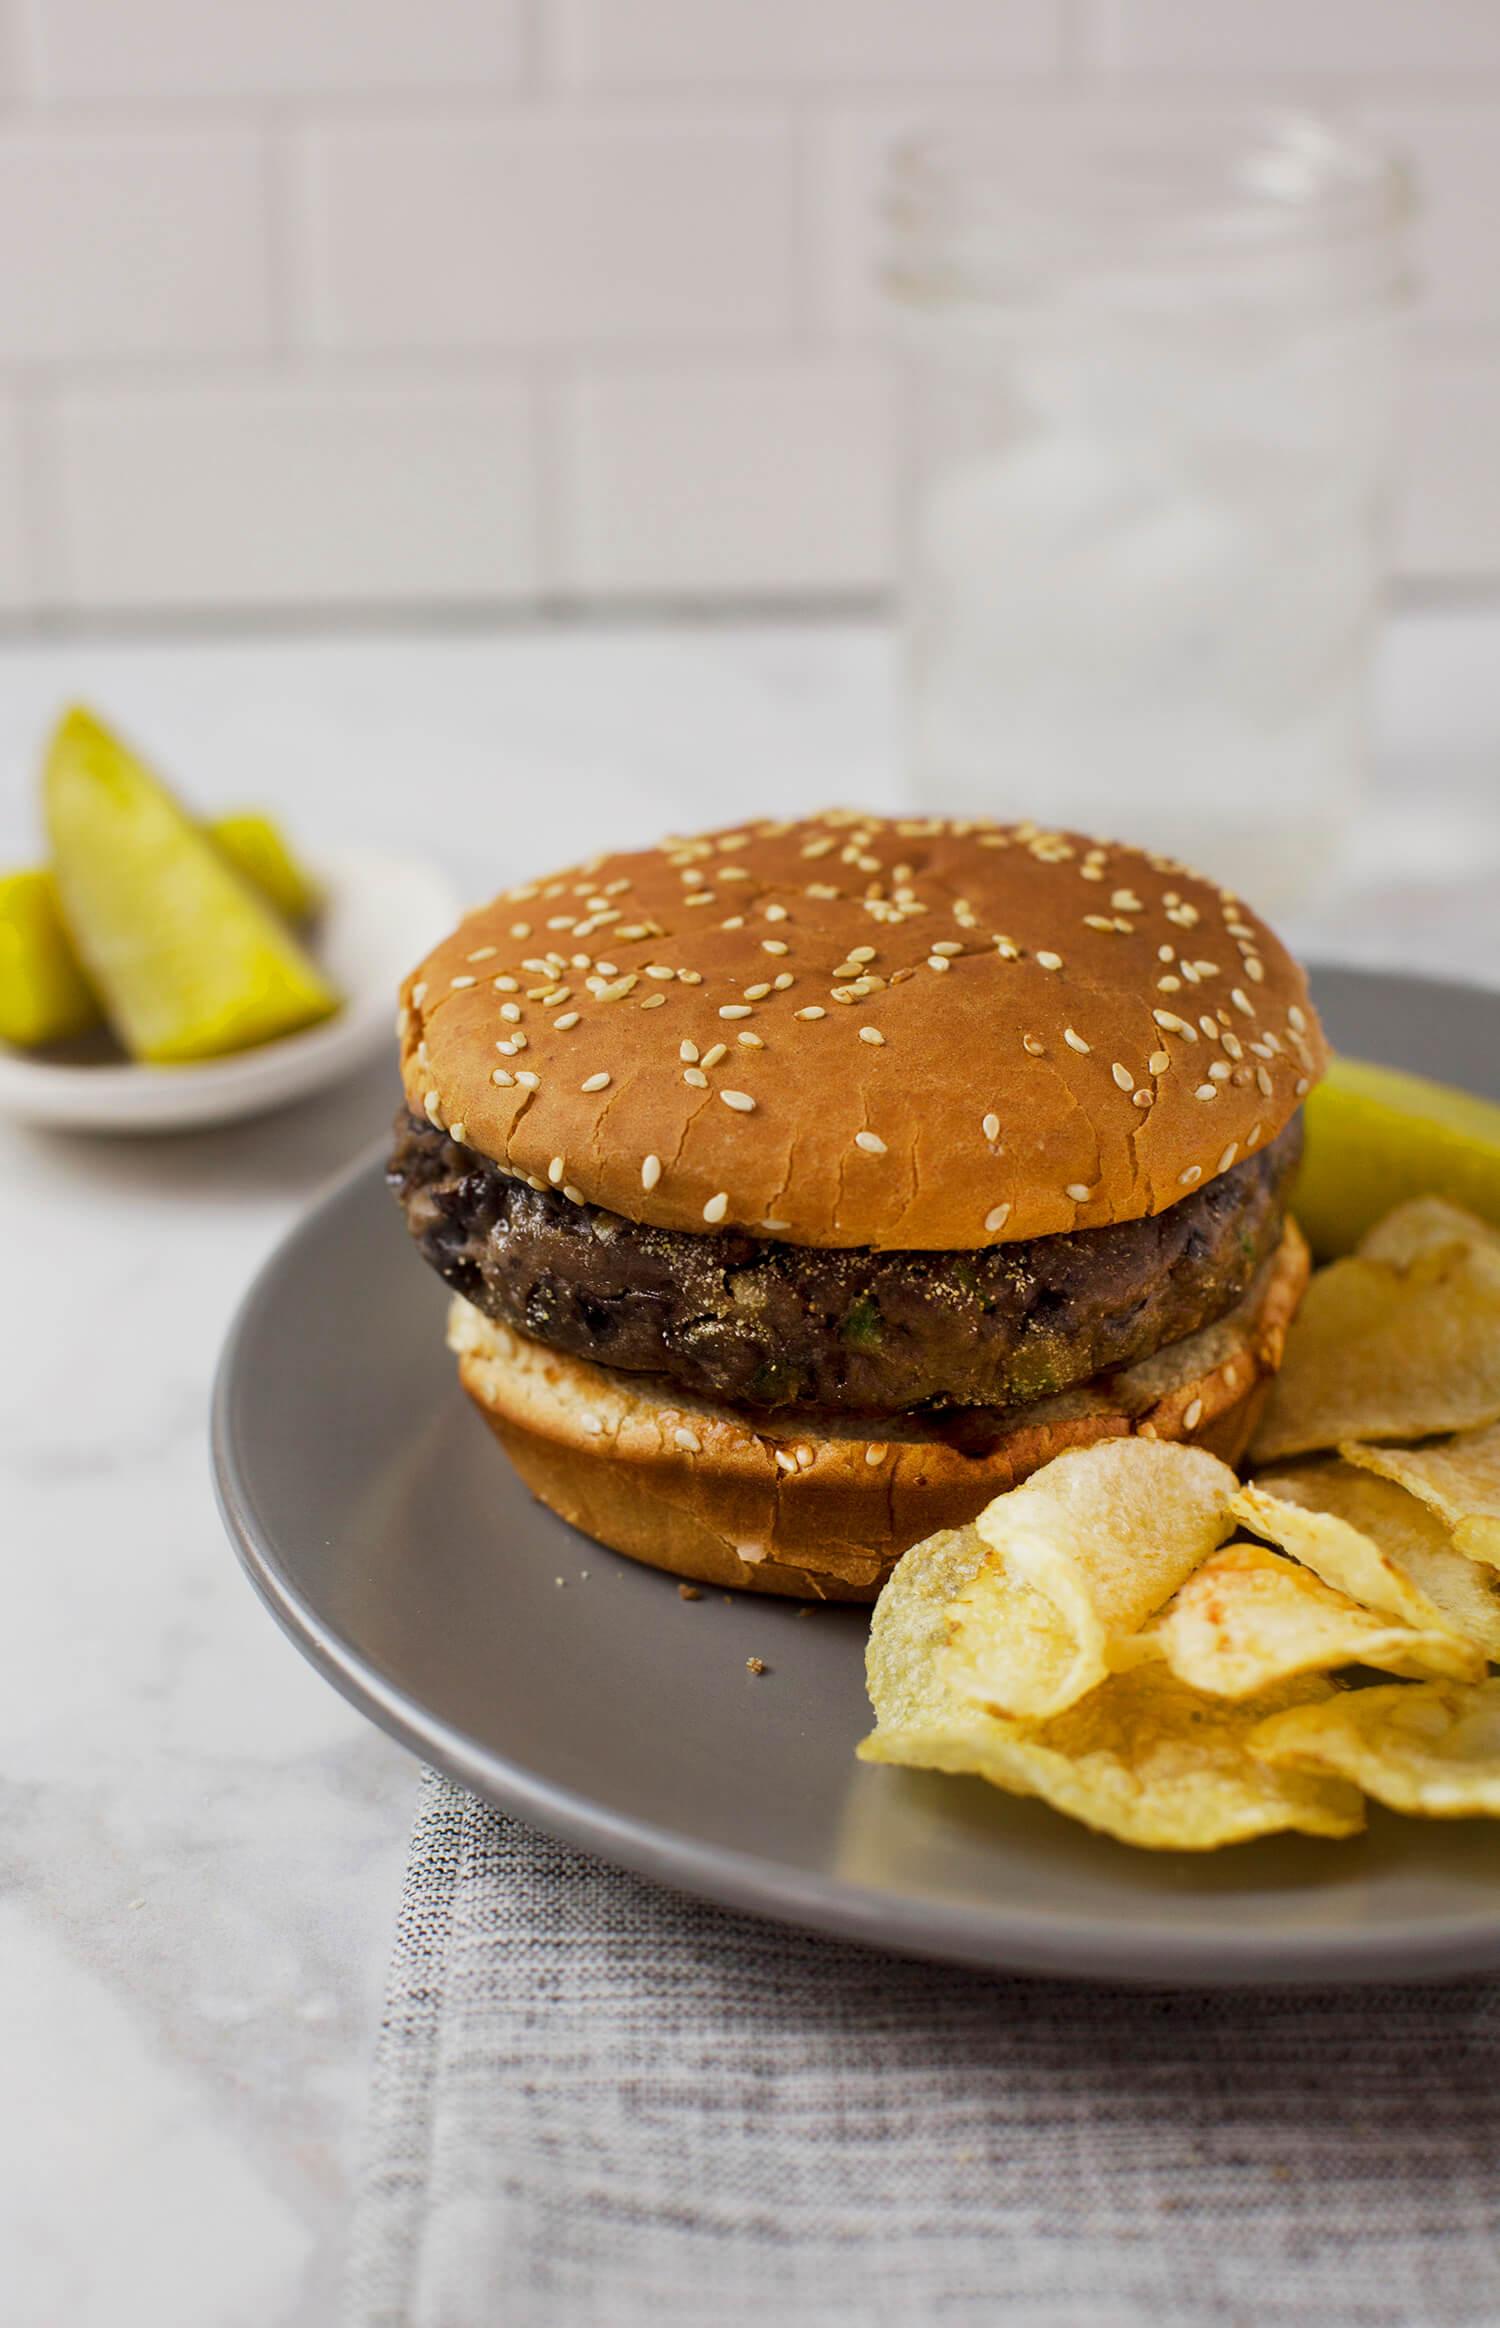 Jalapeno Popper Black Bean Burgers (via abeautifulmess.com)